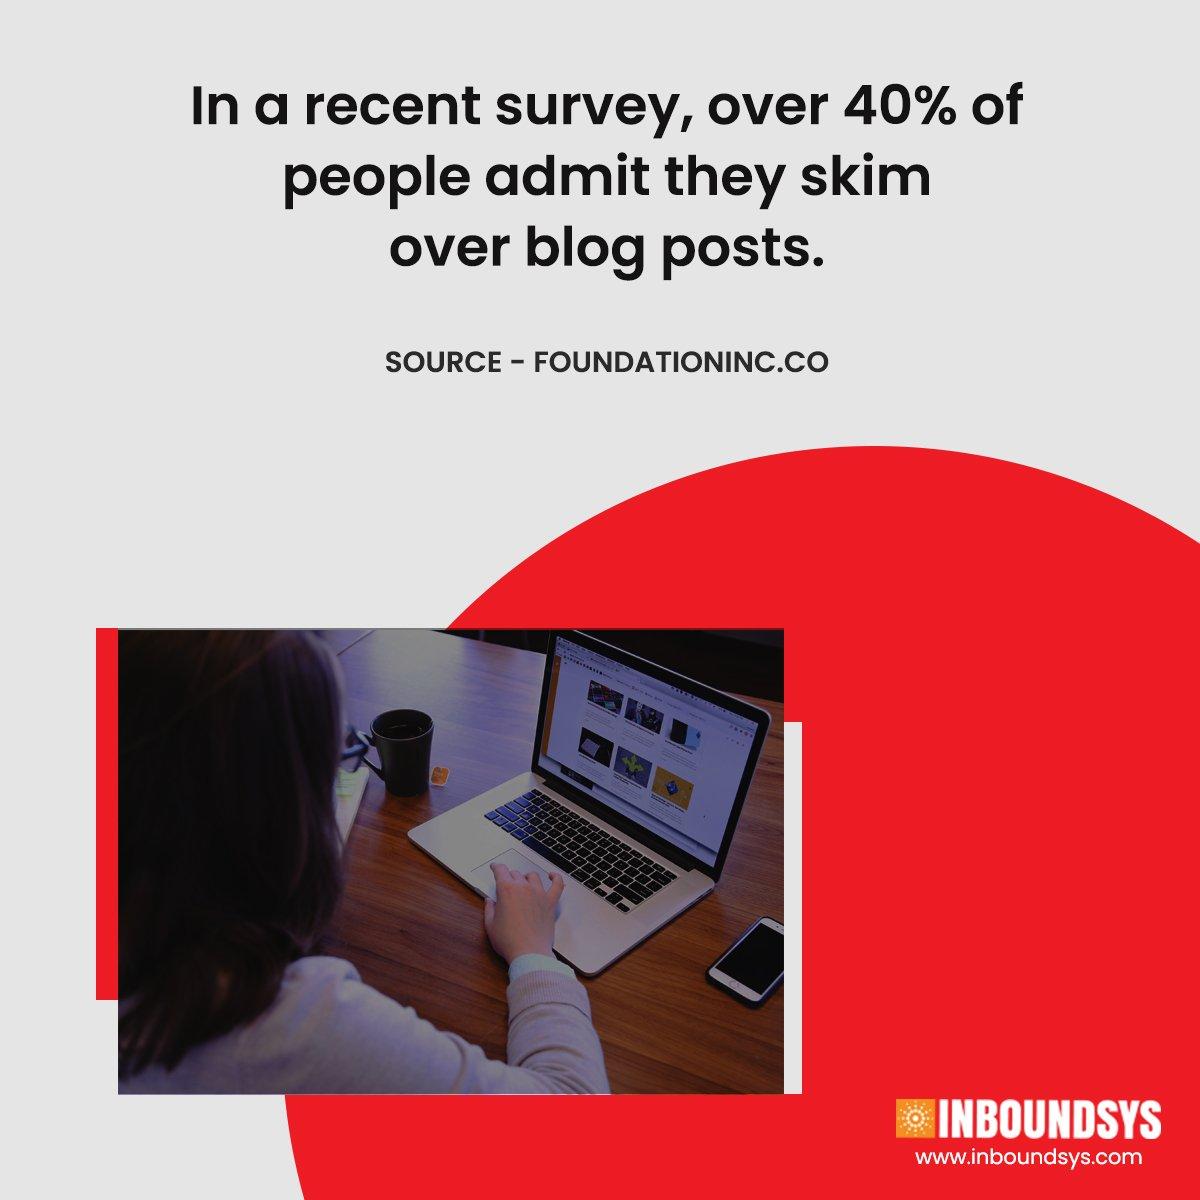 What % of people admit they skim over blog posts? #blog #blogposts #blogging #marketing #inboundmarketing #blogskimming #blogerstyle  #blogs #blogger    #styleblogger #lifestyleblogger #bloglife #bloggerlove  http://bit.ly/2WFx1Eupic.twitter.com/yJ5bMZQSfe